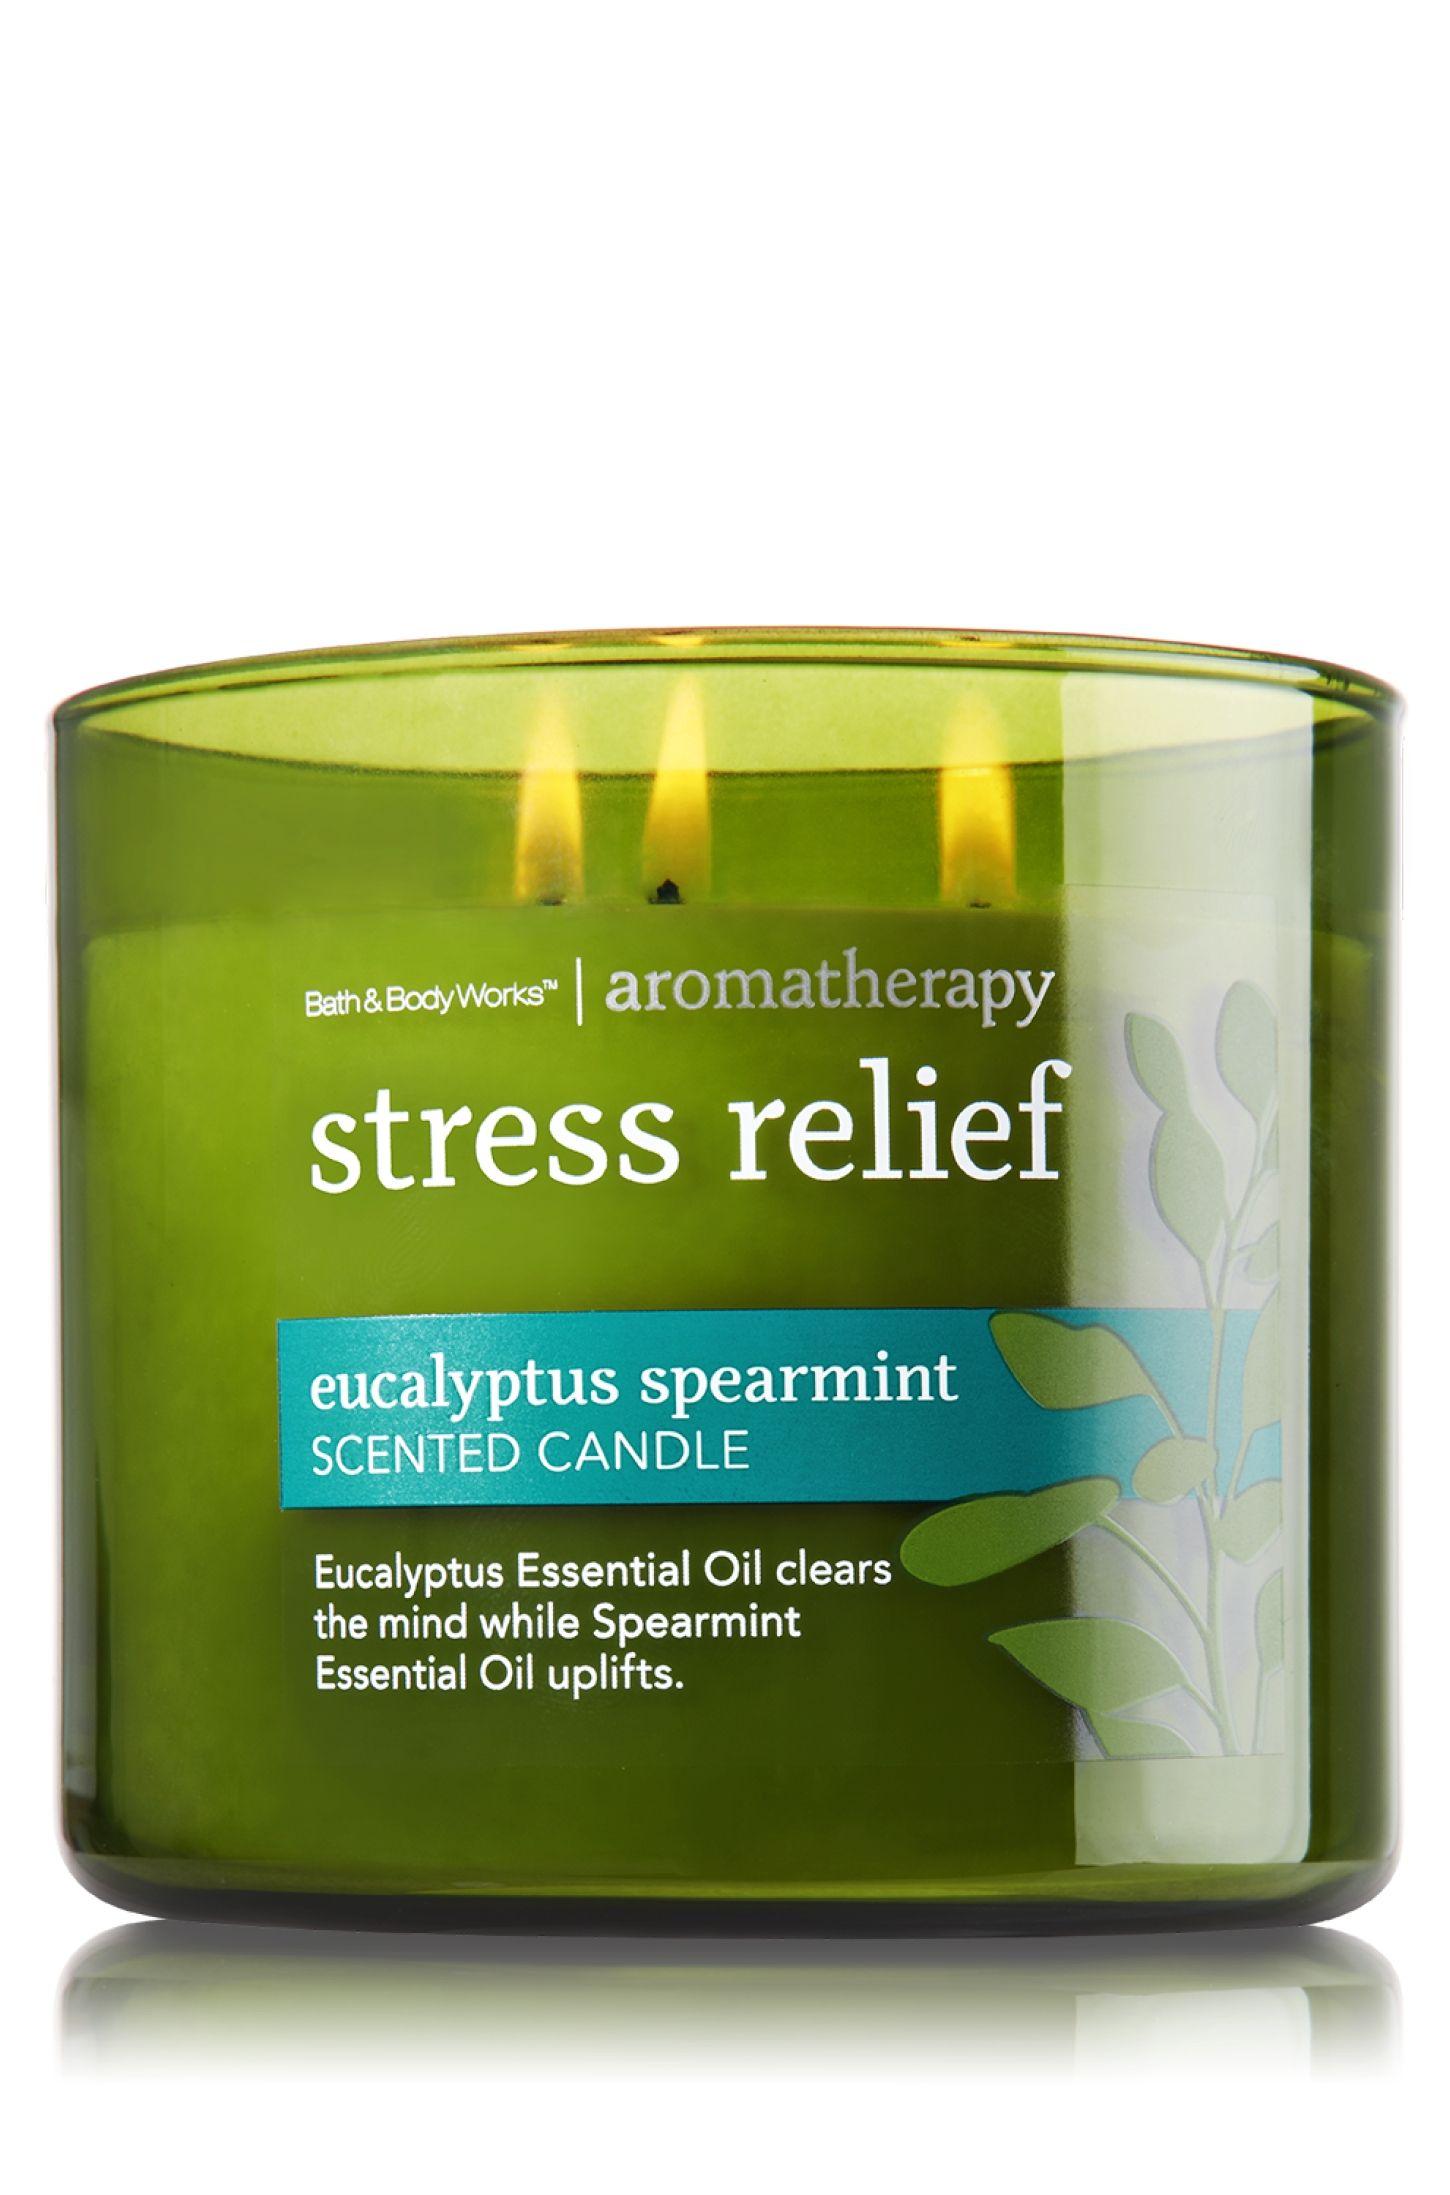 Eucalyptus Spearmint 3 Wick Candle Home Fragrance Bath Body Works Aromatherapy Stress Relief Aromatherapy Candles Bath Candles